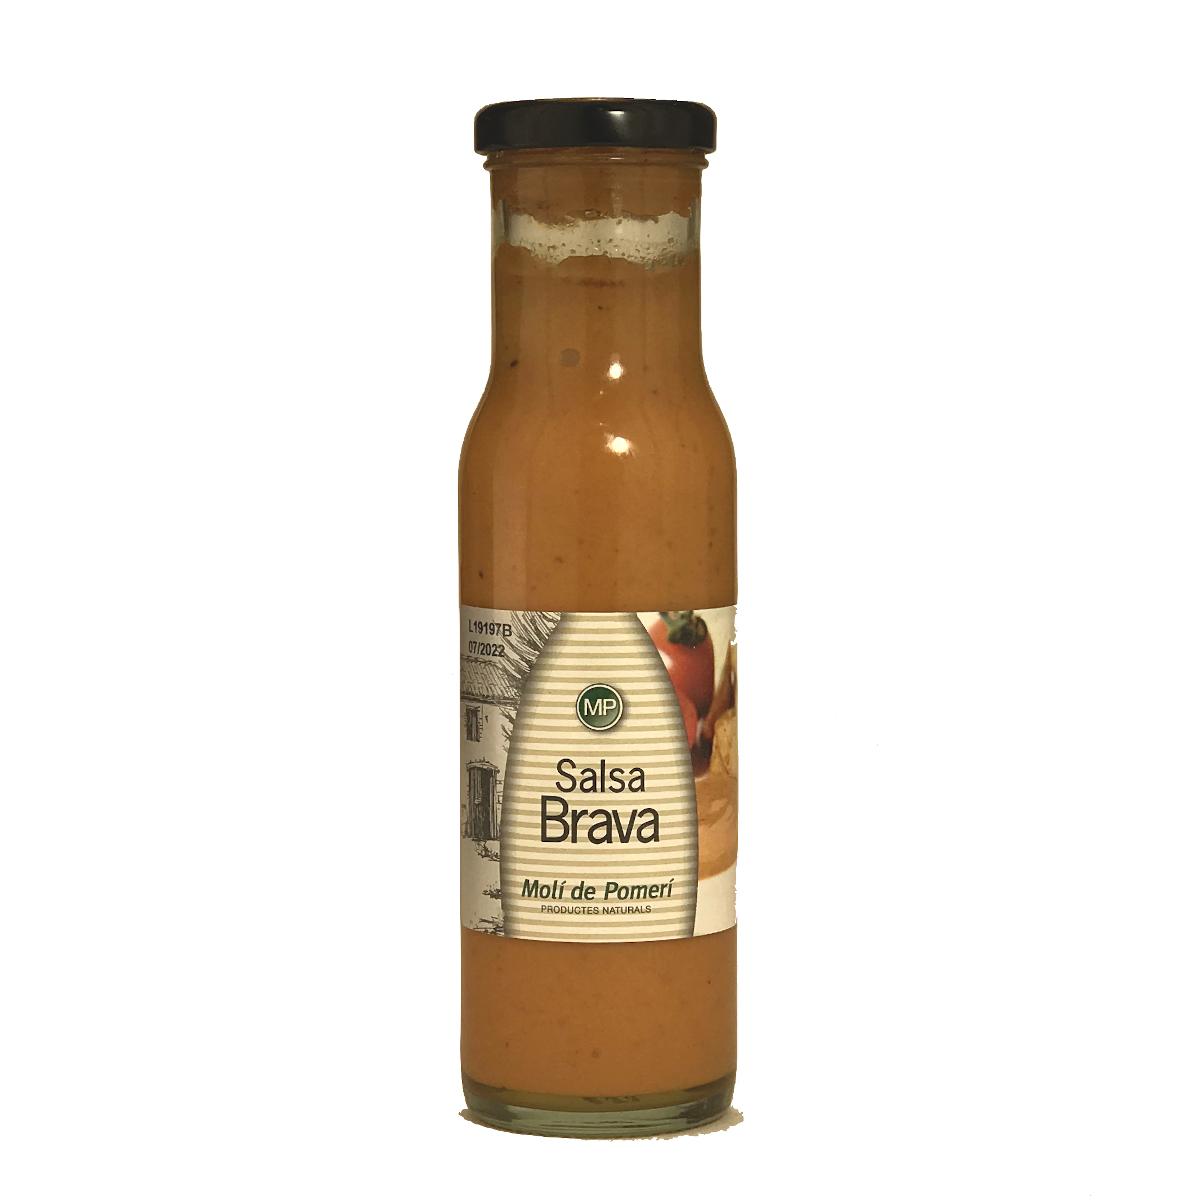 Salsa Brava - spanische Grillsauce - Molí de Pomerí